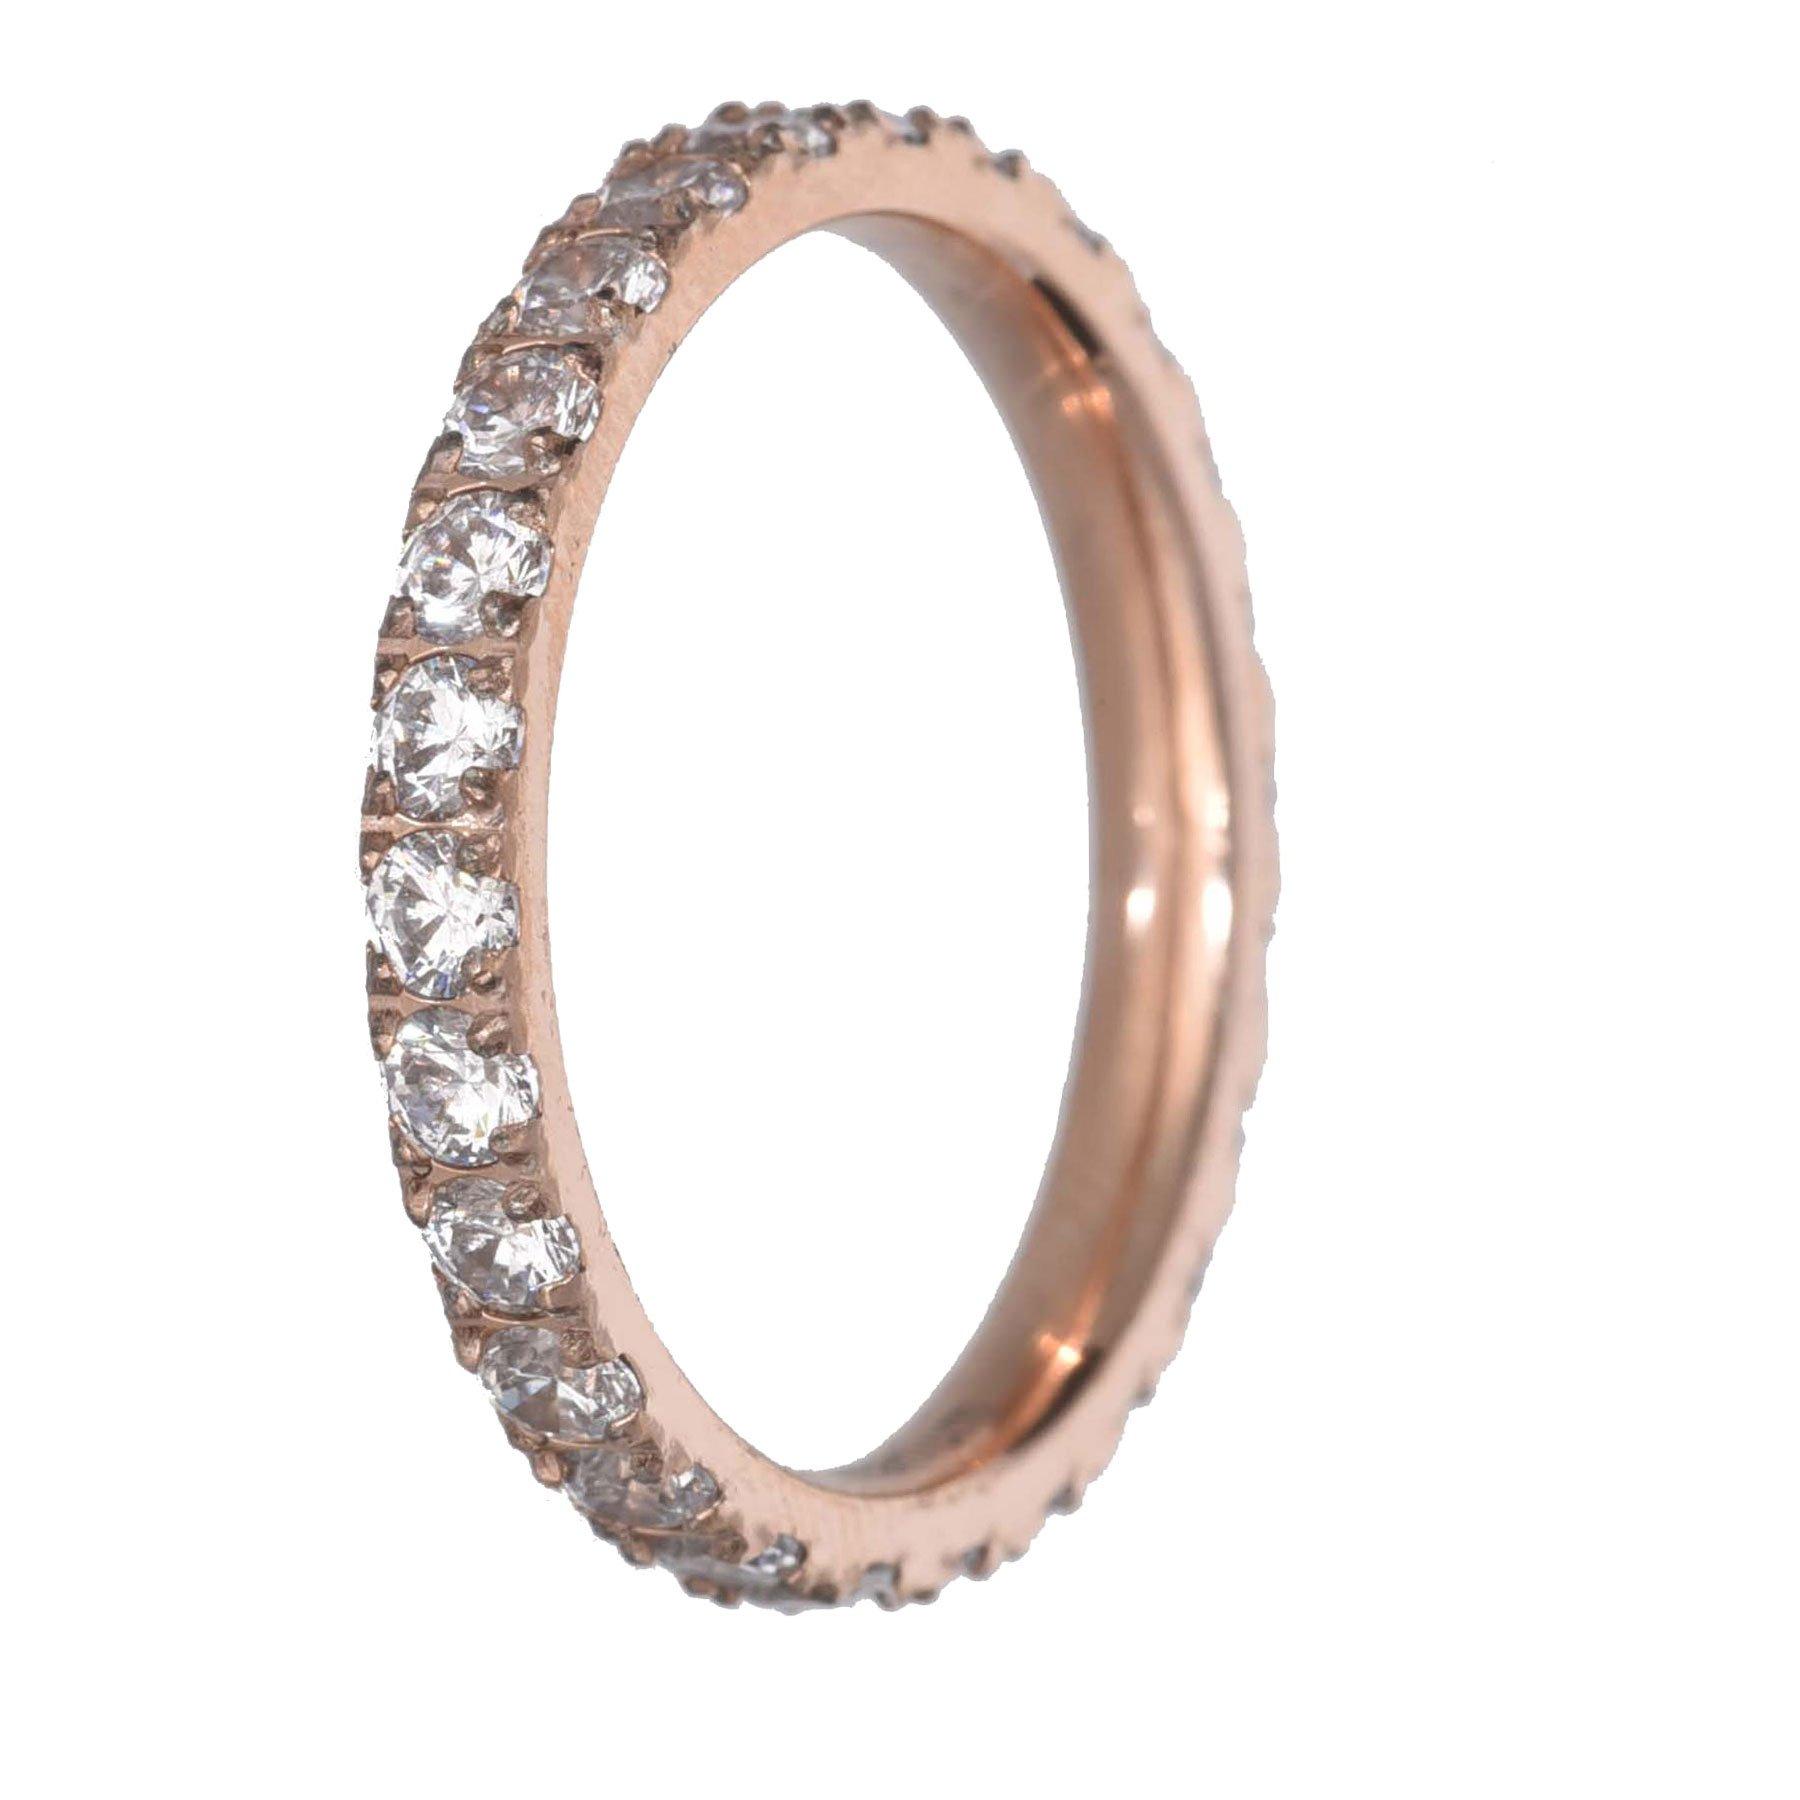 FlameReflection Womens Rose Gold Plated Titanium Eternity Rings White CZ Wedding Engagement Band size 7